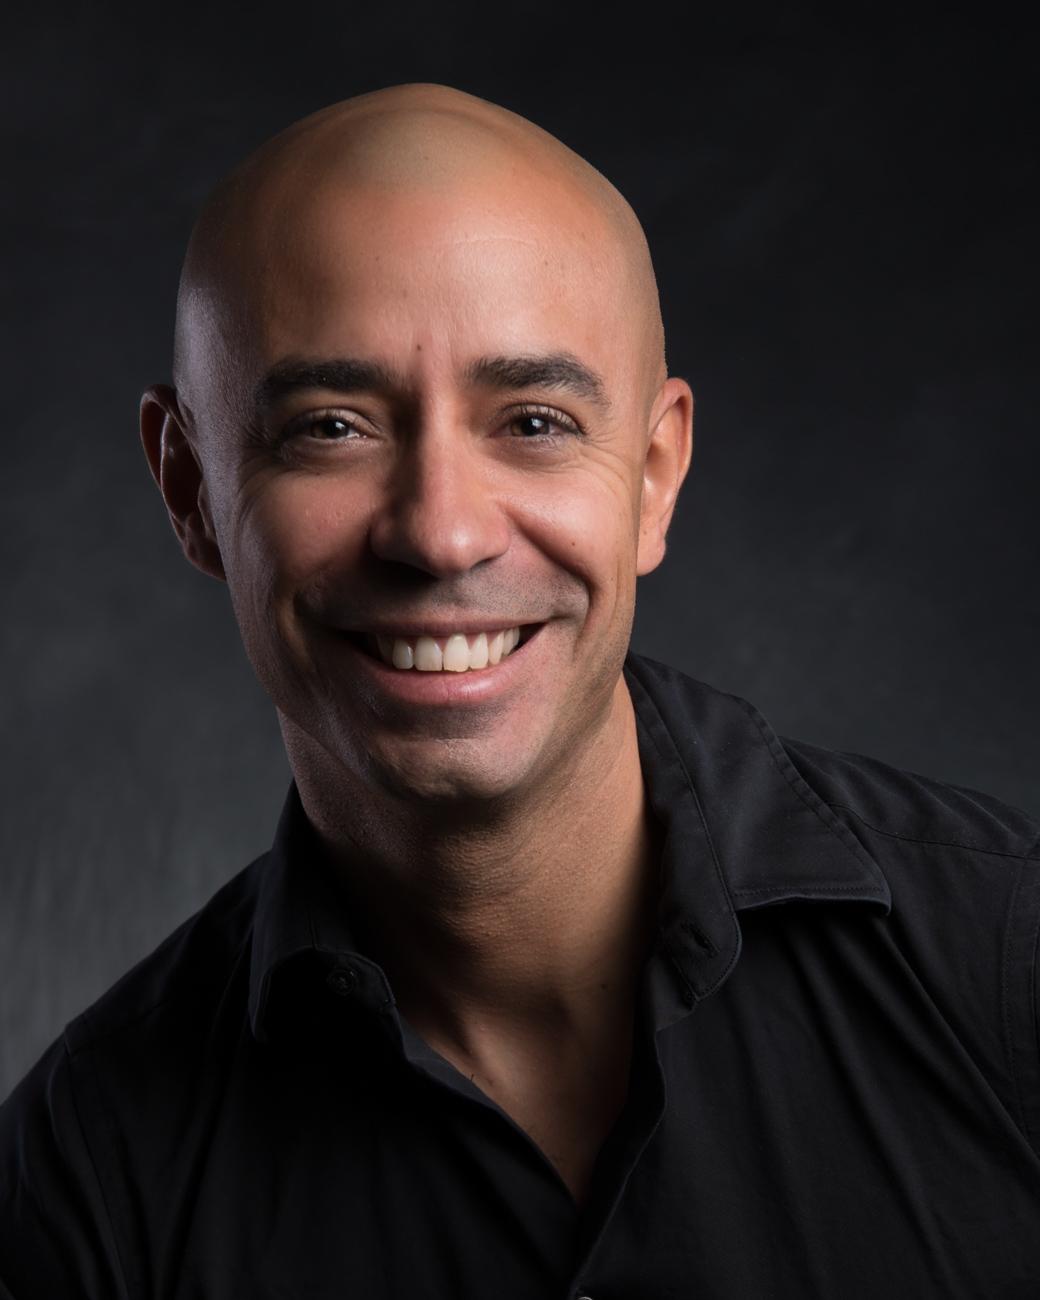 studio headshot of a smiling man for professional branding